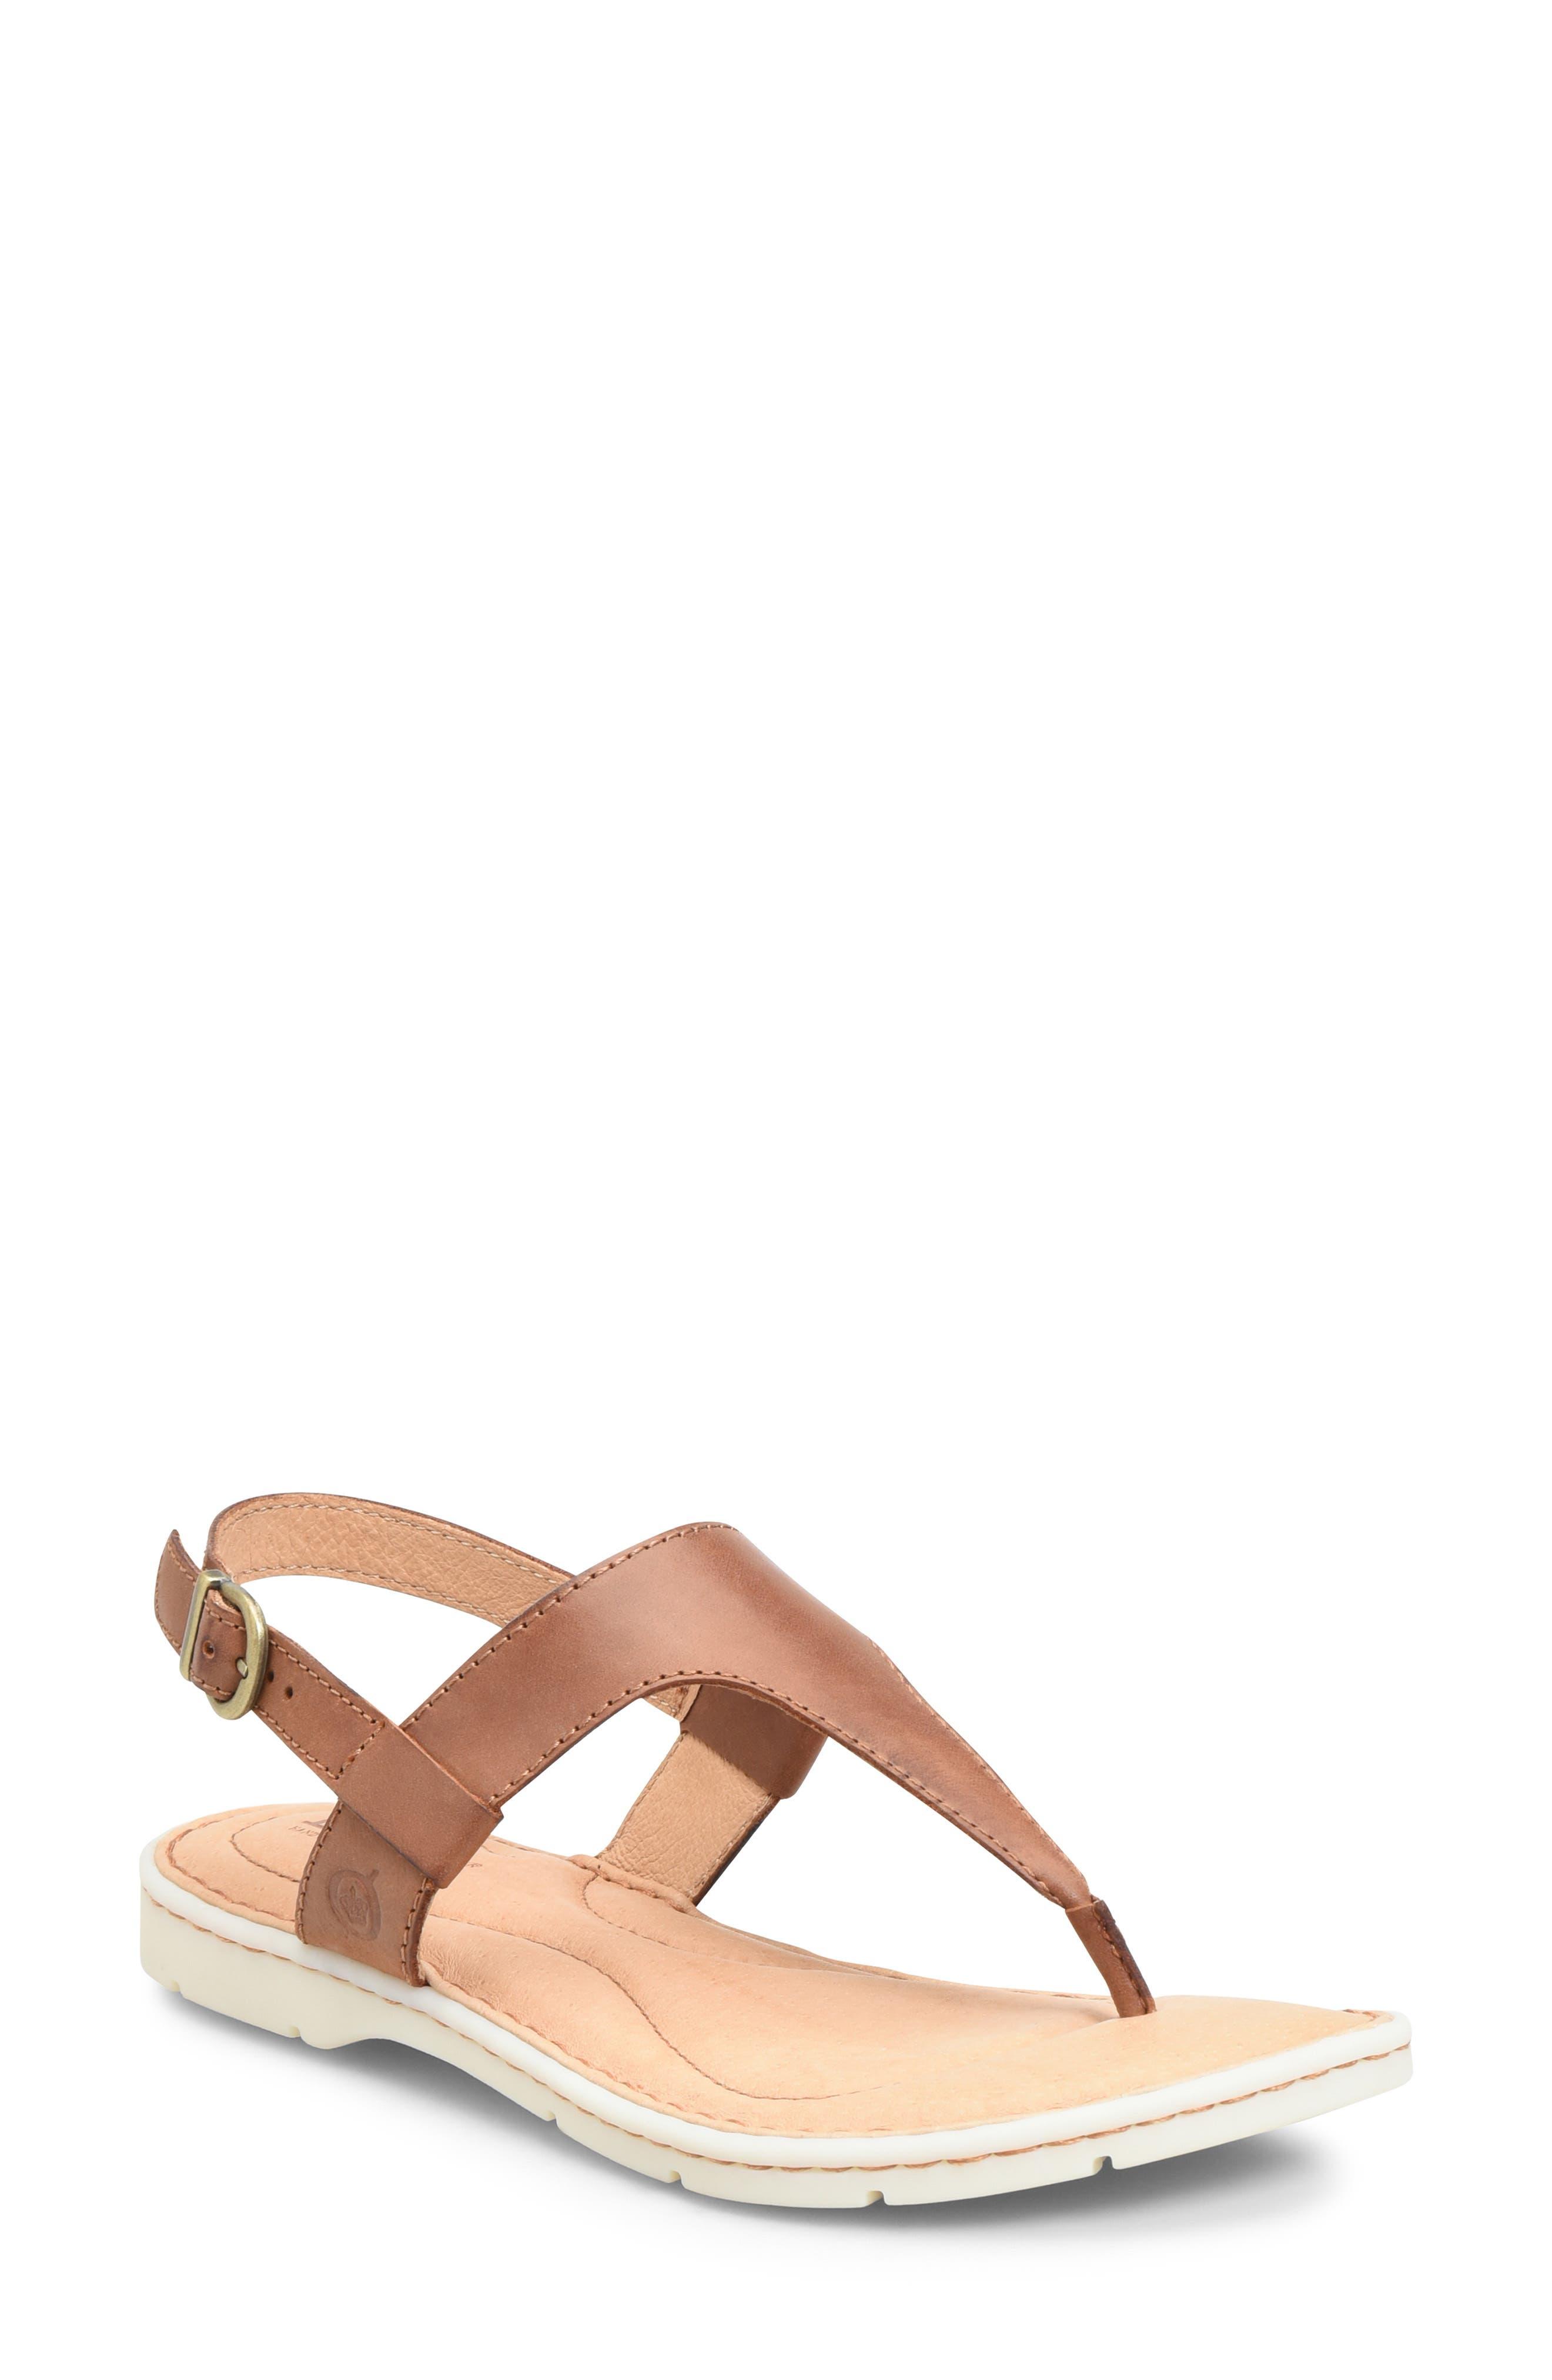 B?rn Taylor V-Strap Sandal, Brown